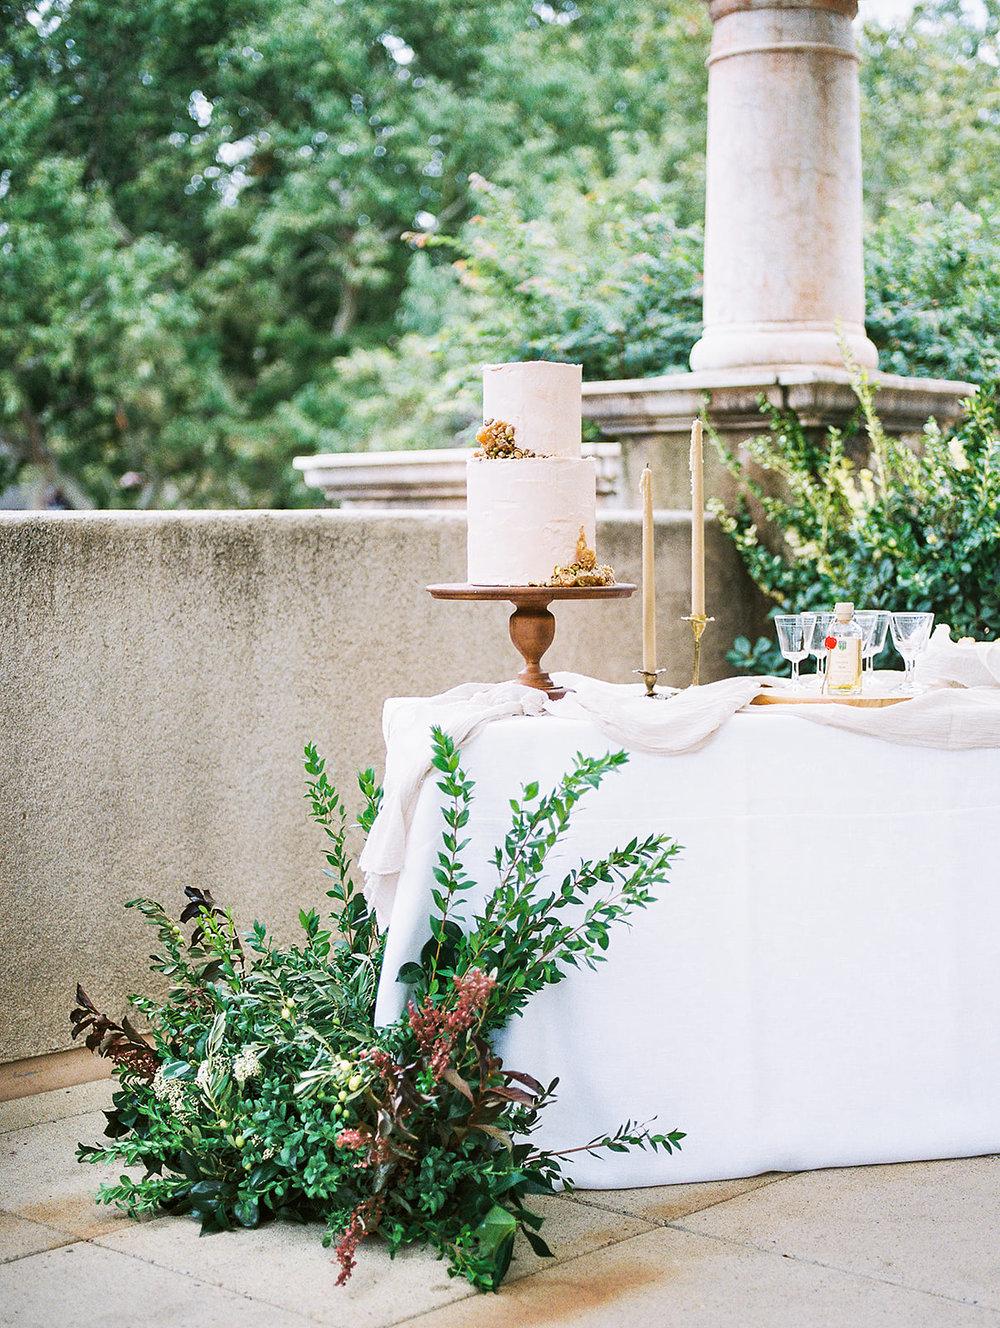 Erika_Kobziak-Tlaquepaque_Wedding-Andrew_and_Ada_Photography_2018-022.jpg